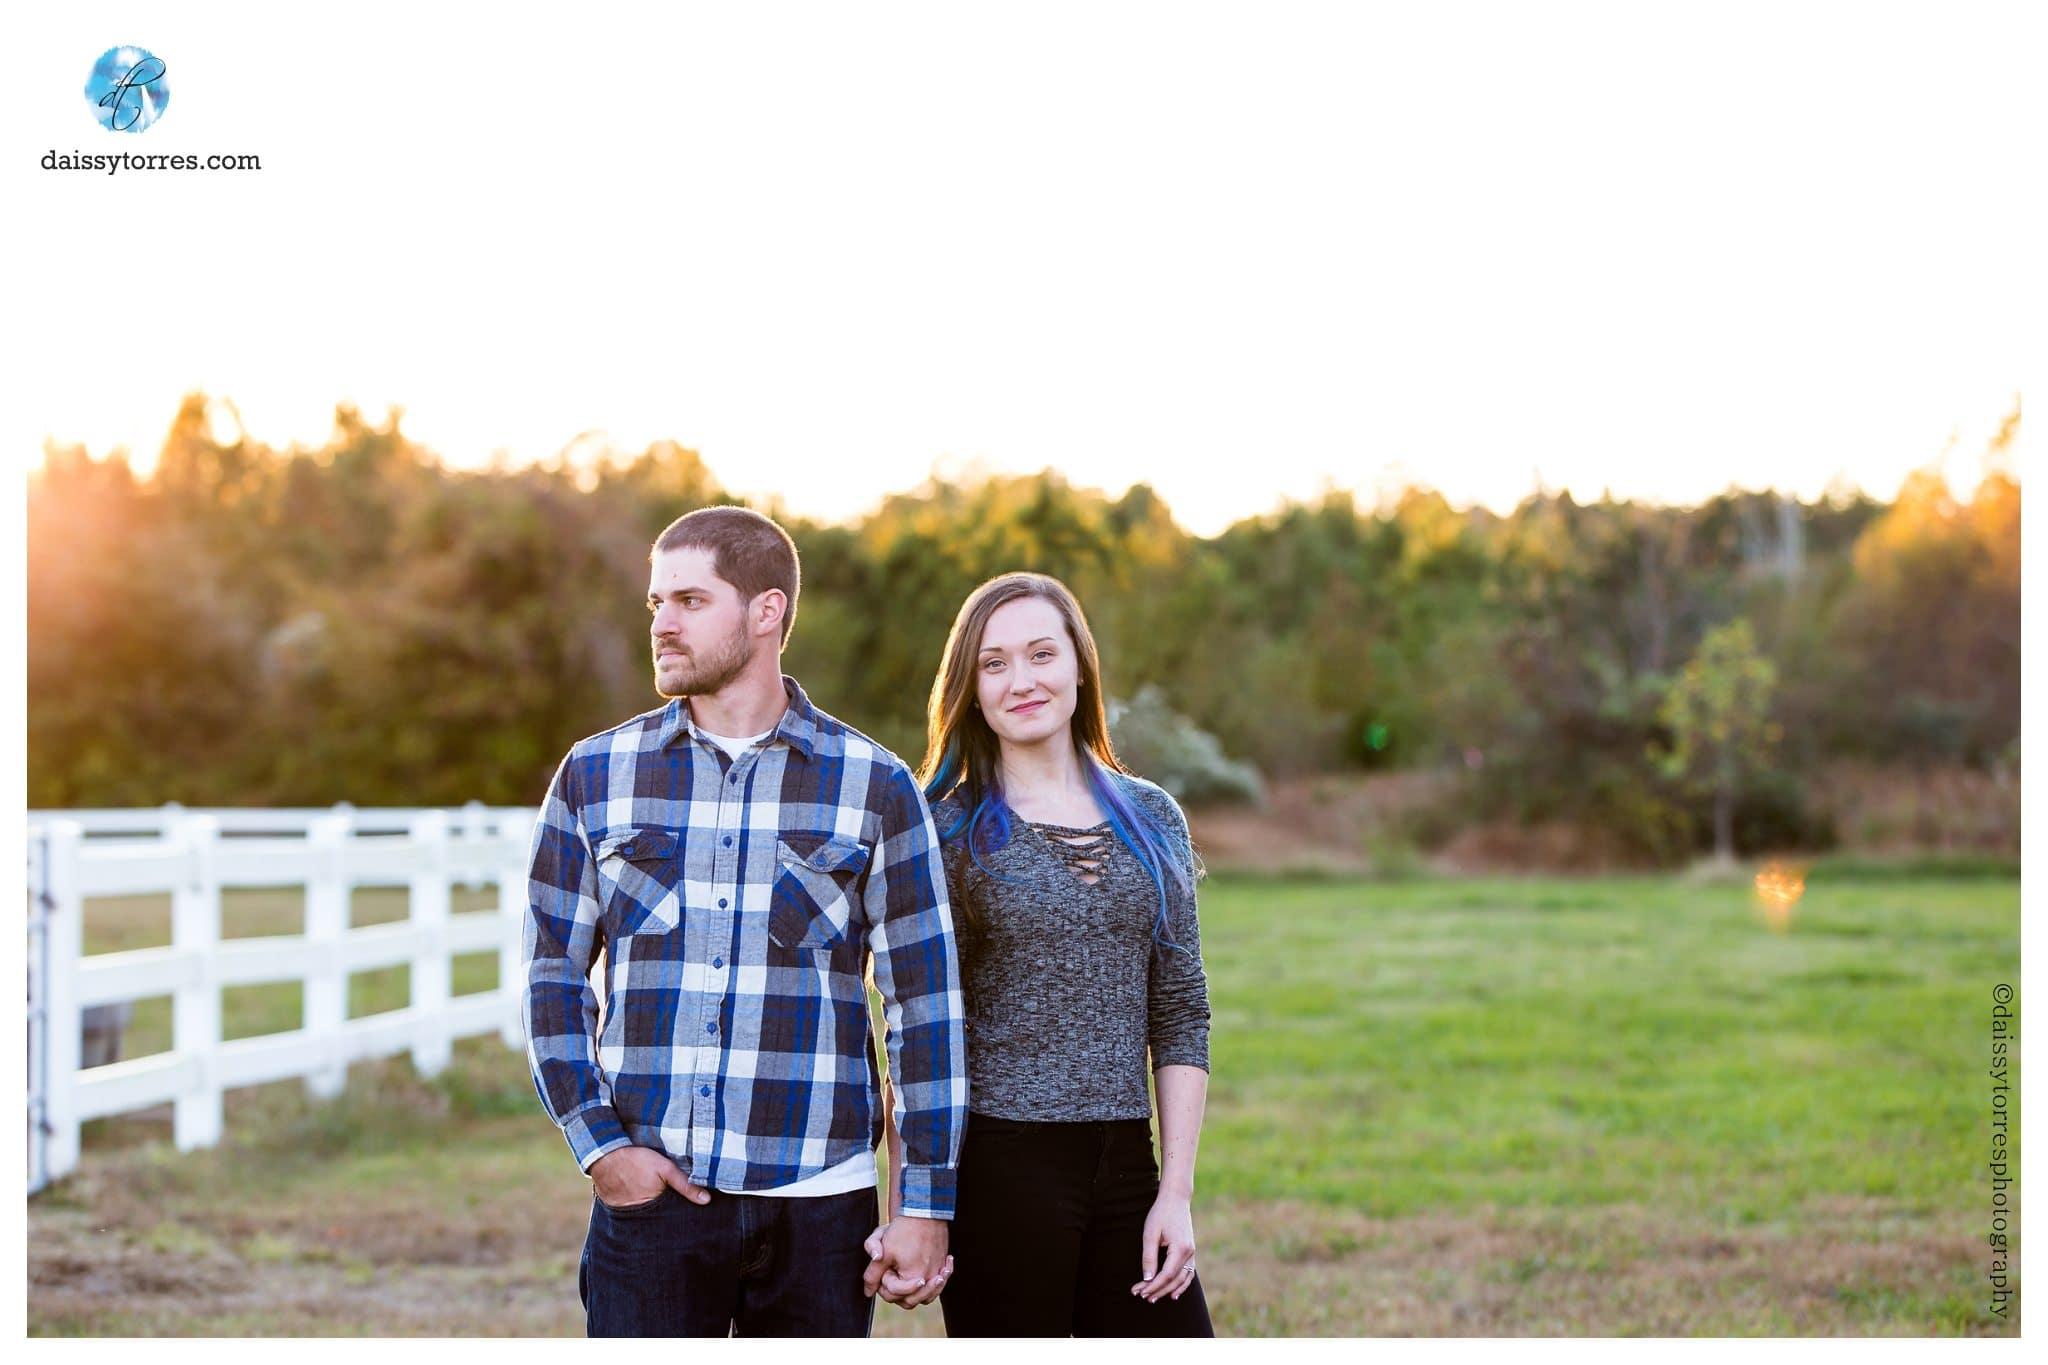 Back Bay Engagement Session - couple